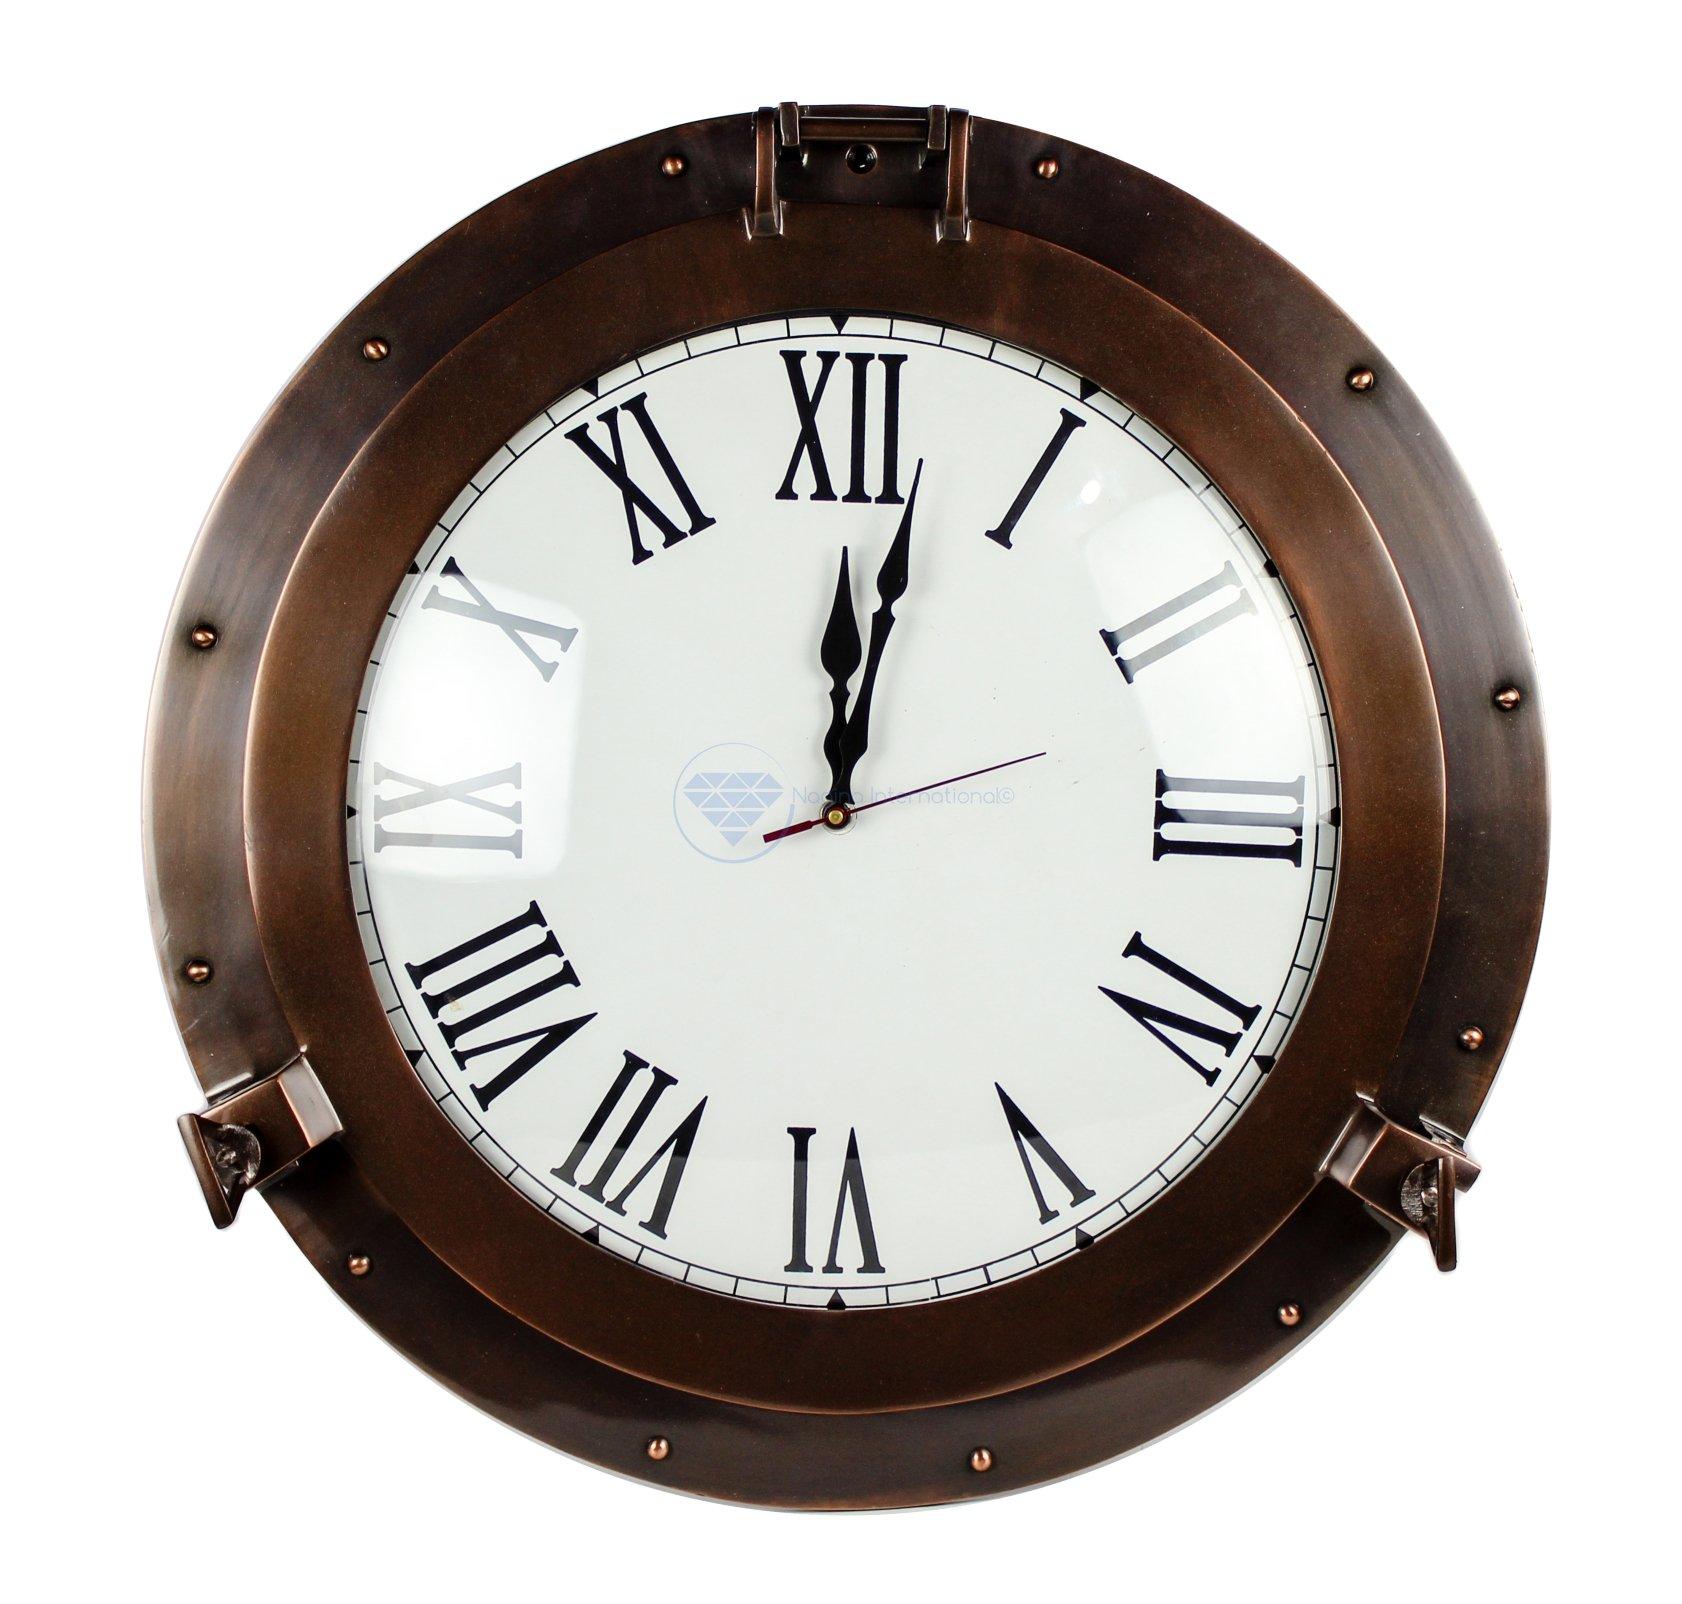 20'' Antique Matte Copper Brown Porthole Nautical Roman Clock   Large Lavish Sailor's Maritime Gift   Nagina International